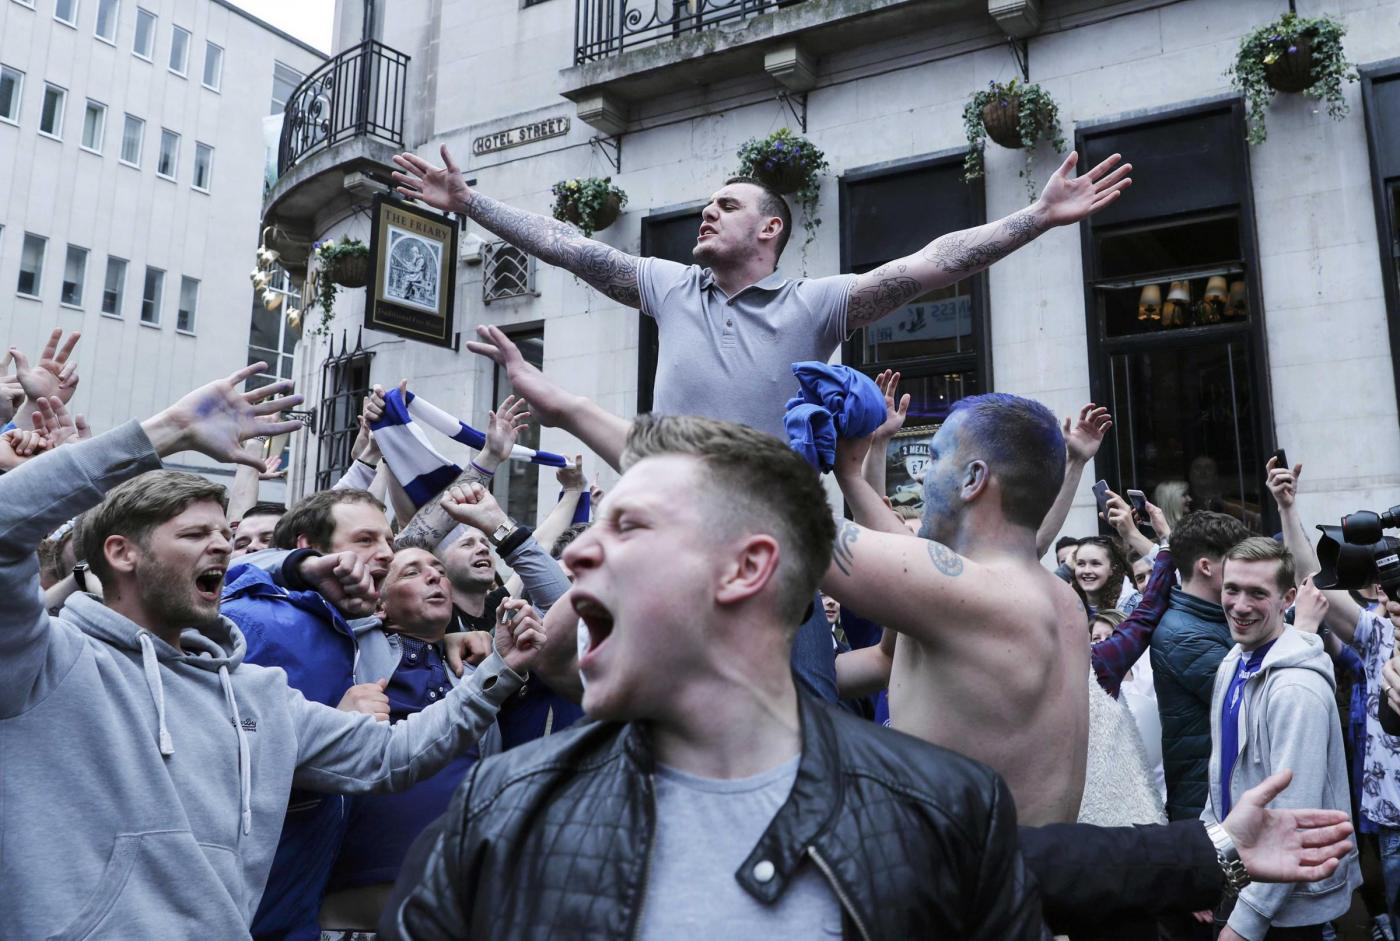 Leicester vince la Premier League, Ranieri è campione d'Inghilterra